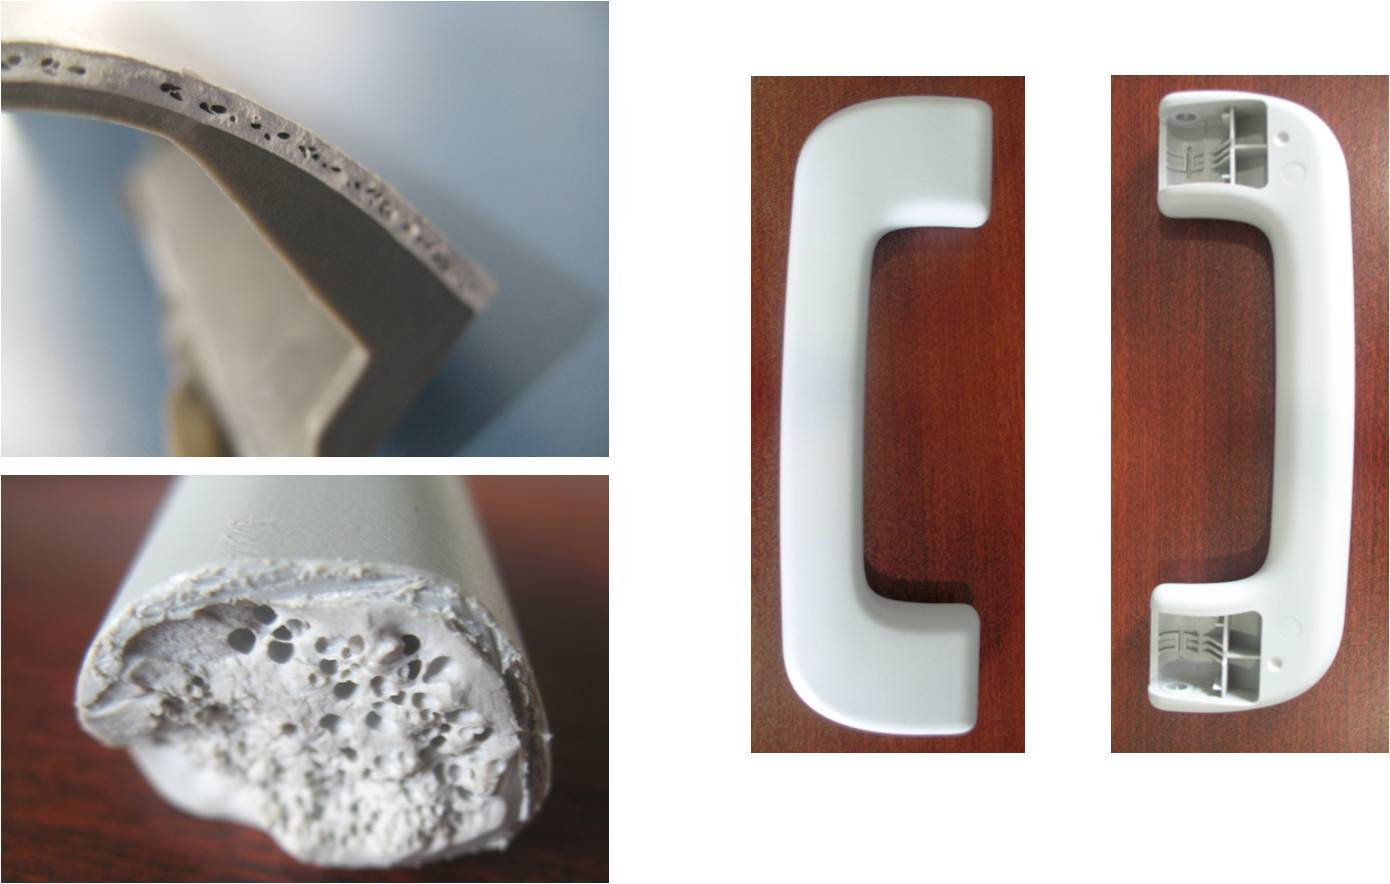 Microcellular moulds handle